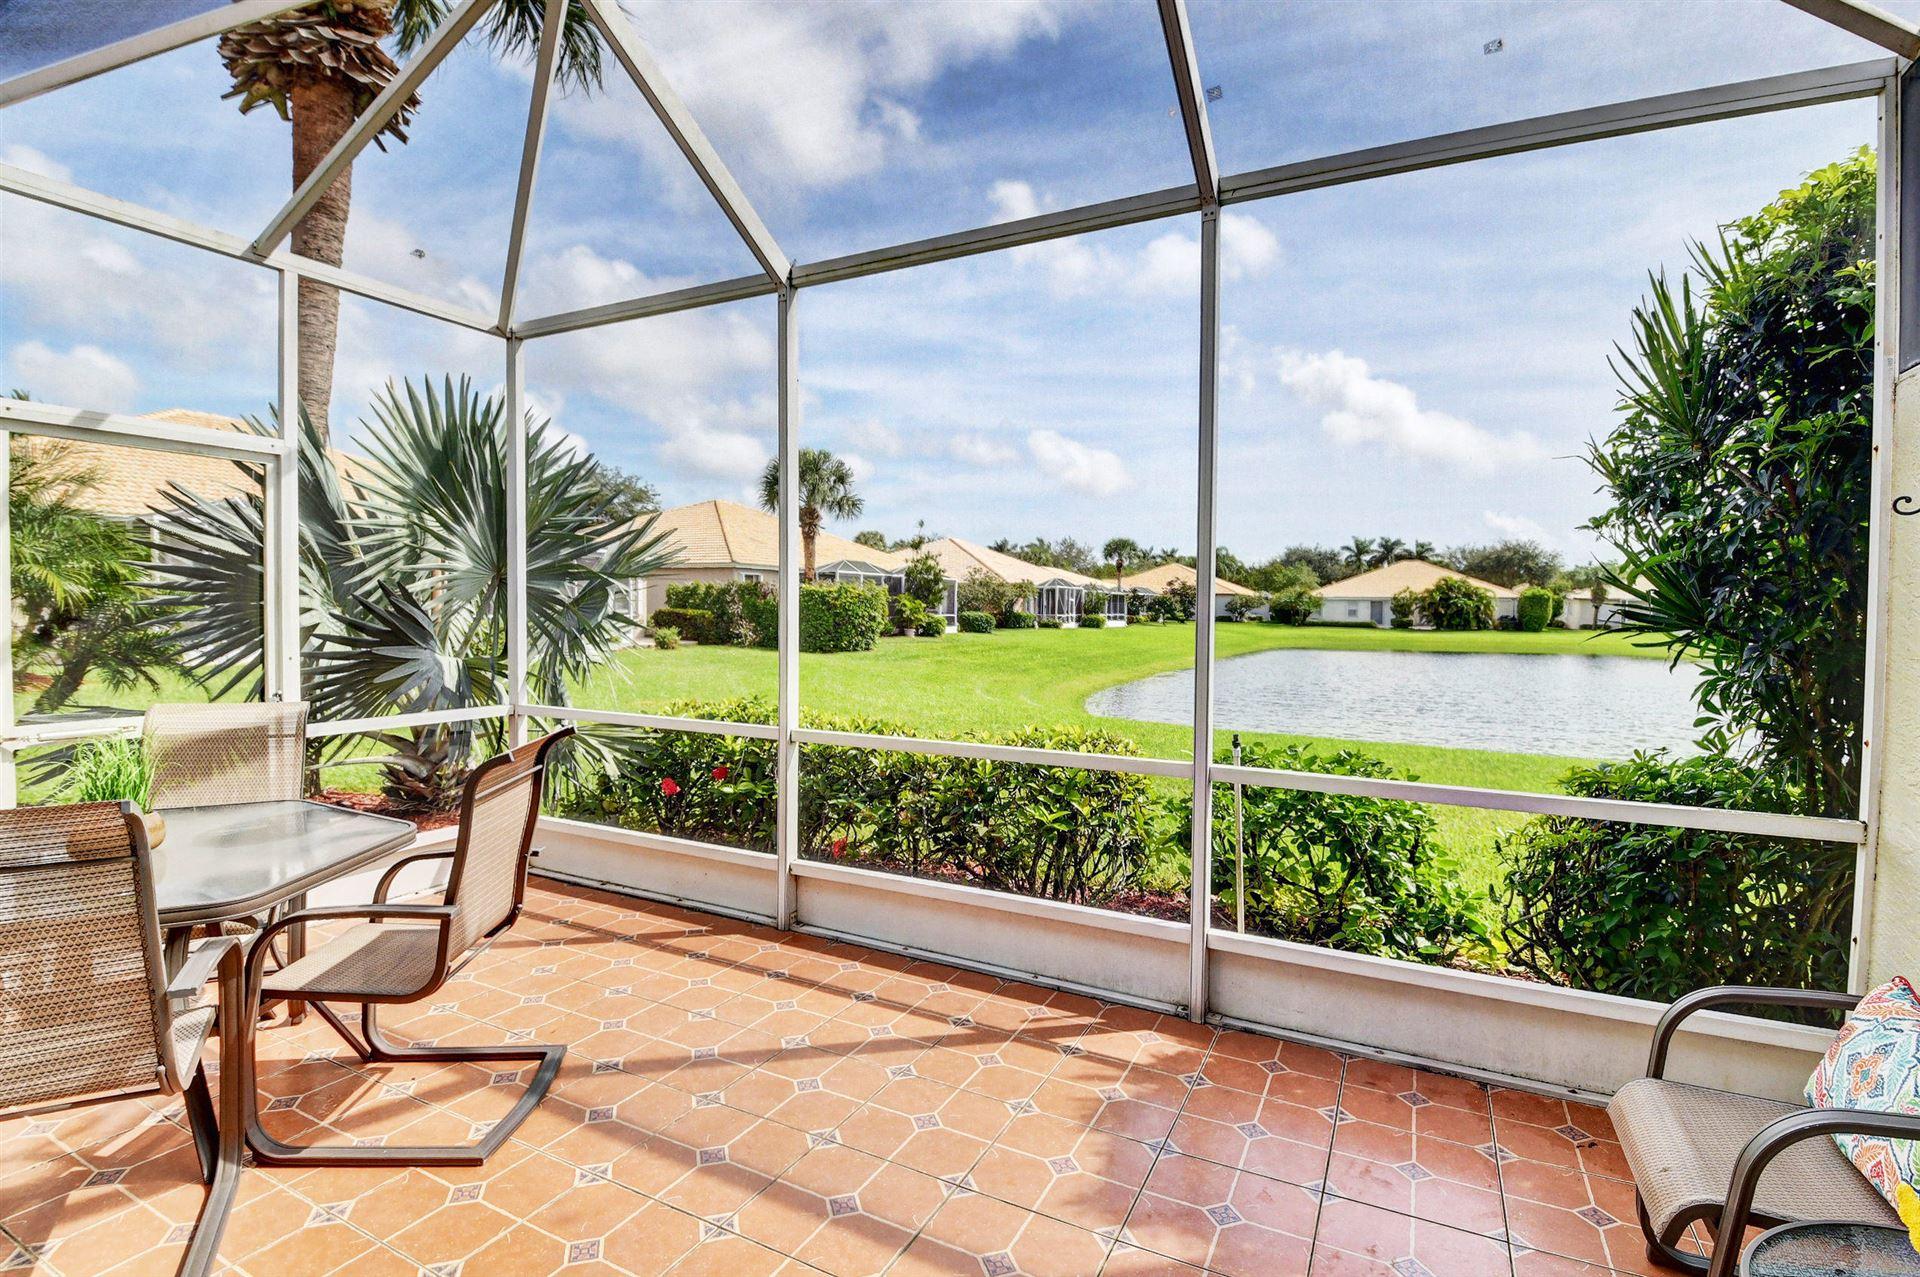 10609 Royal Caribbean Circle, Boynton Beach, FL 33437 - #: RX-10660960